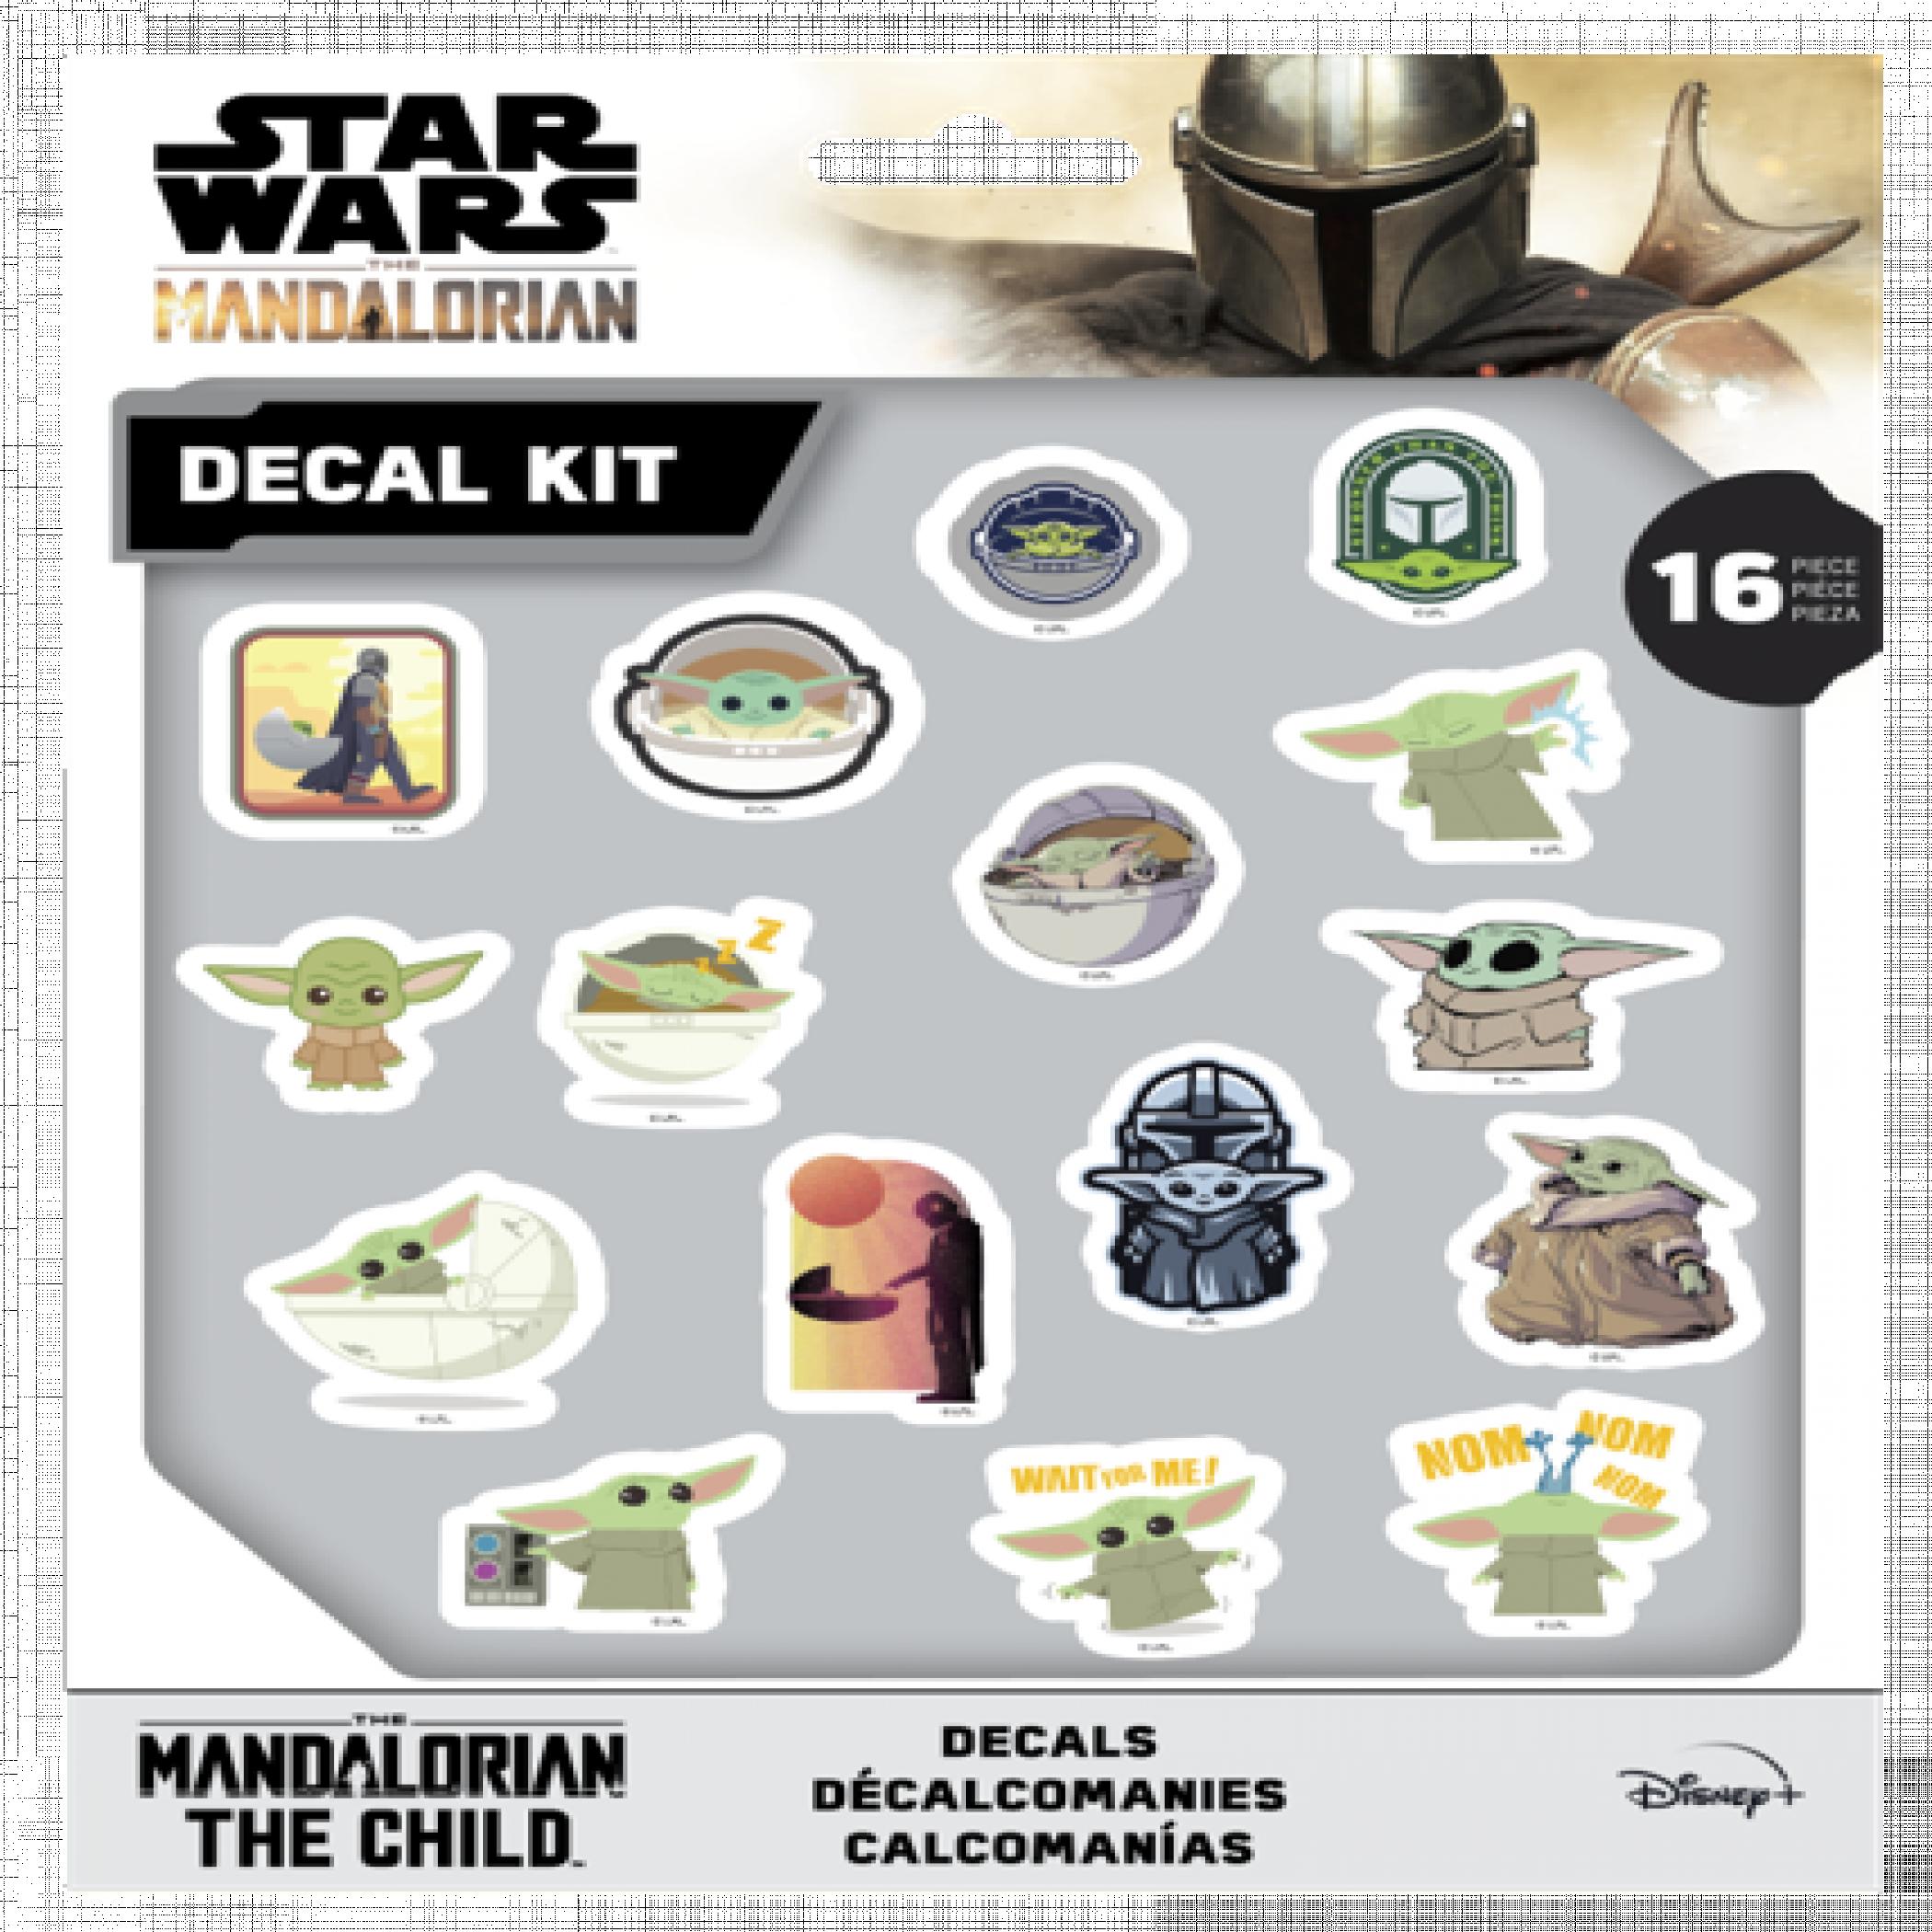 Star Wars The Mandalorian 16 Piece Decal Kit